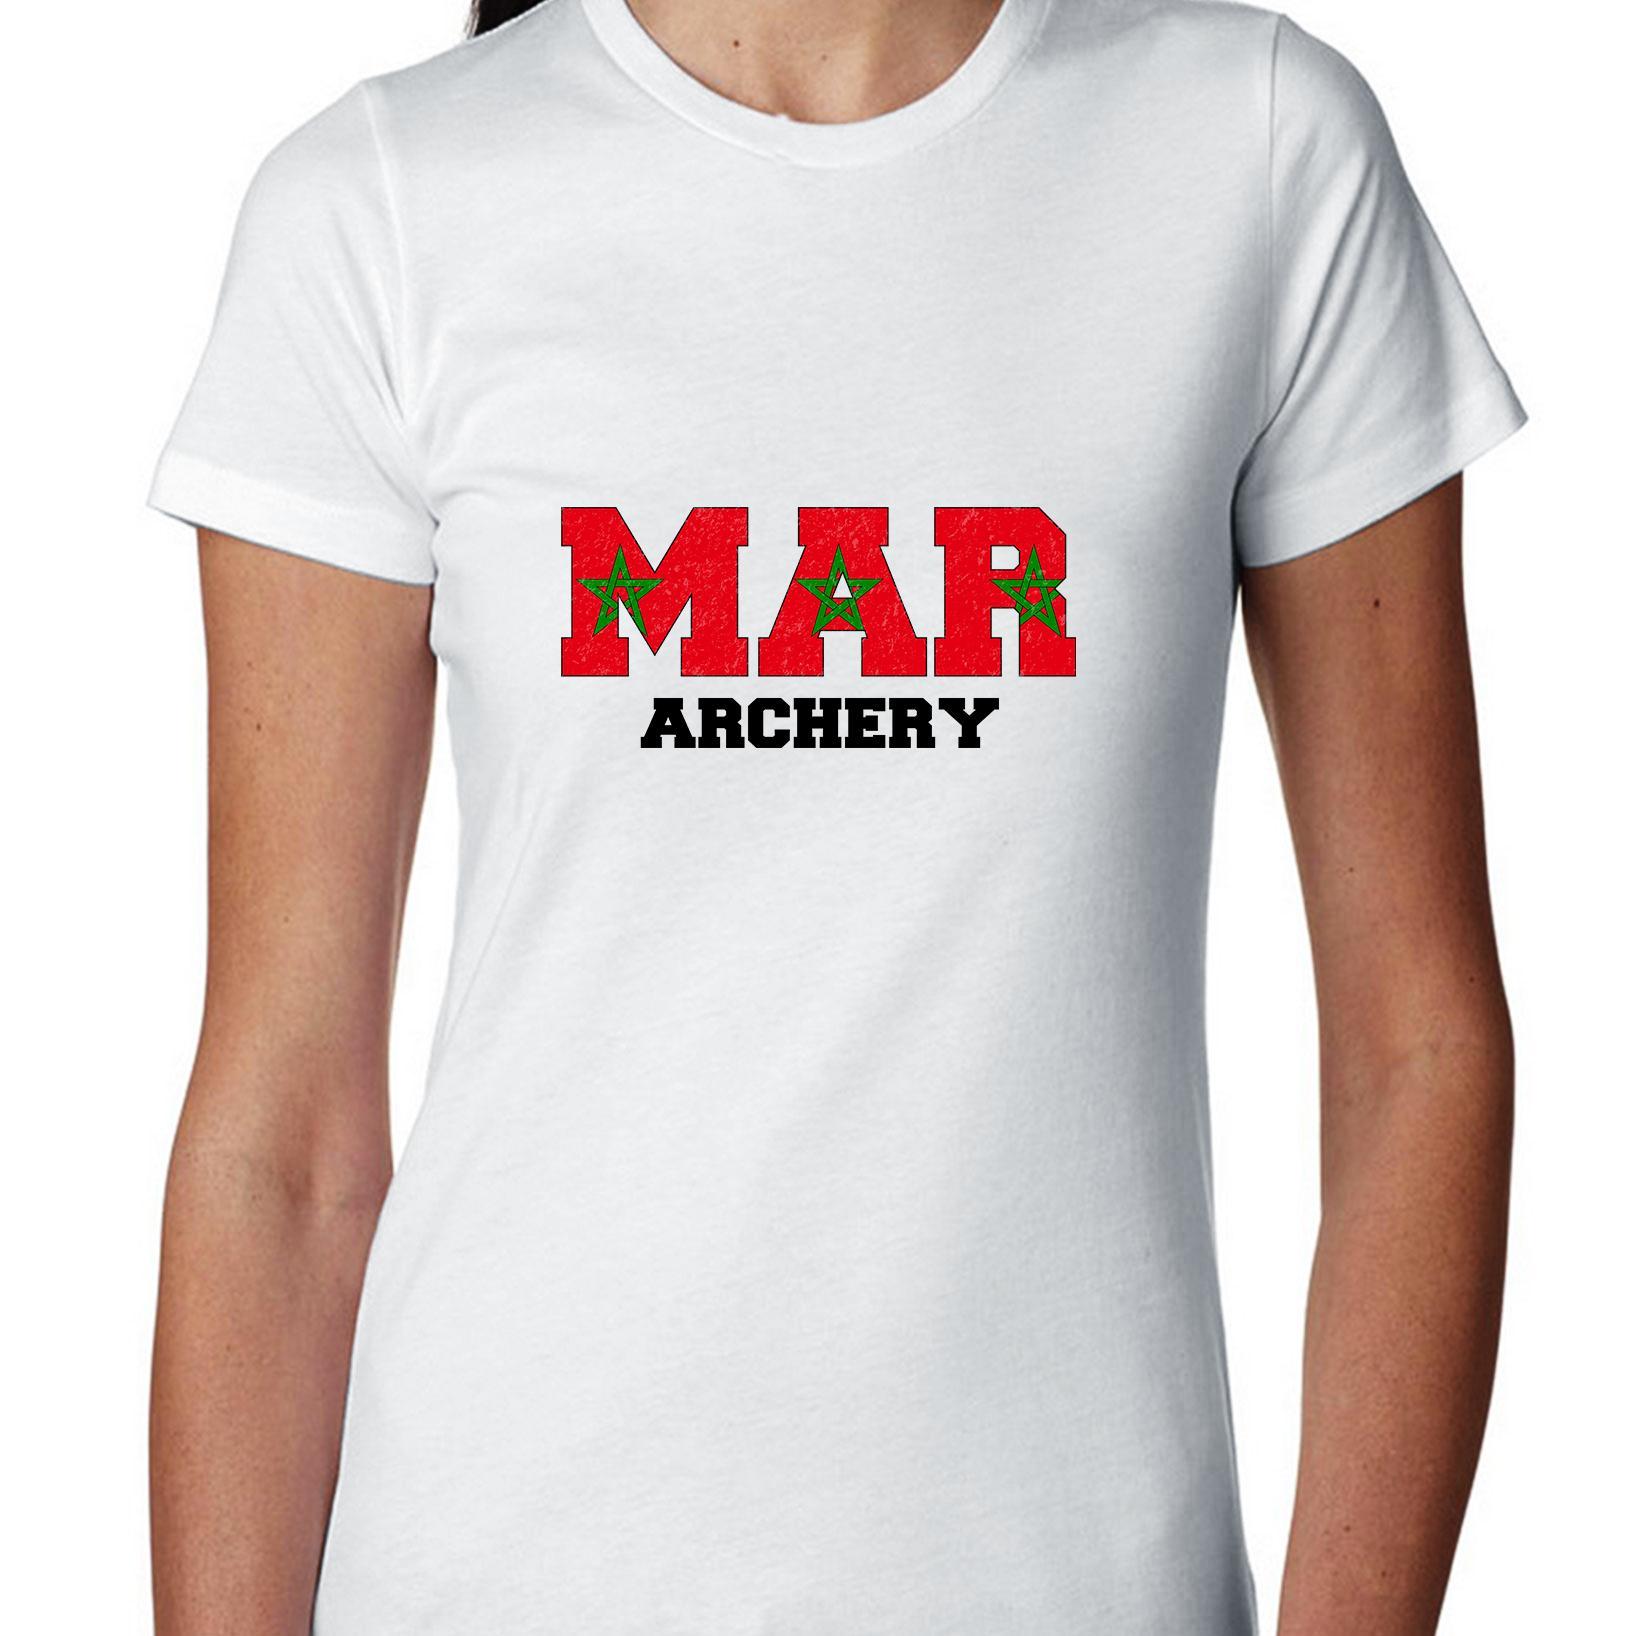 Morocco Archery - Olympic Games - Rio - Flag Women's Cotton T-Shirt